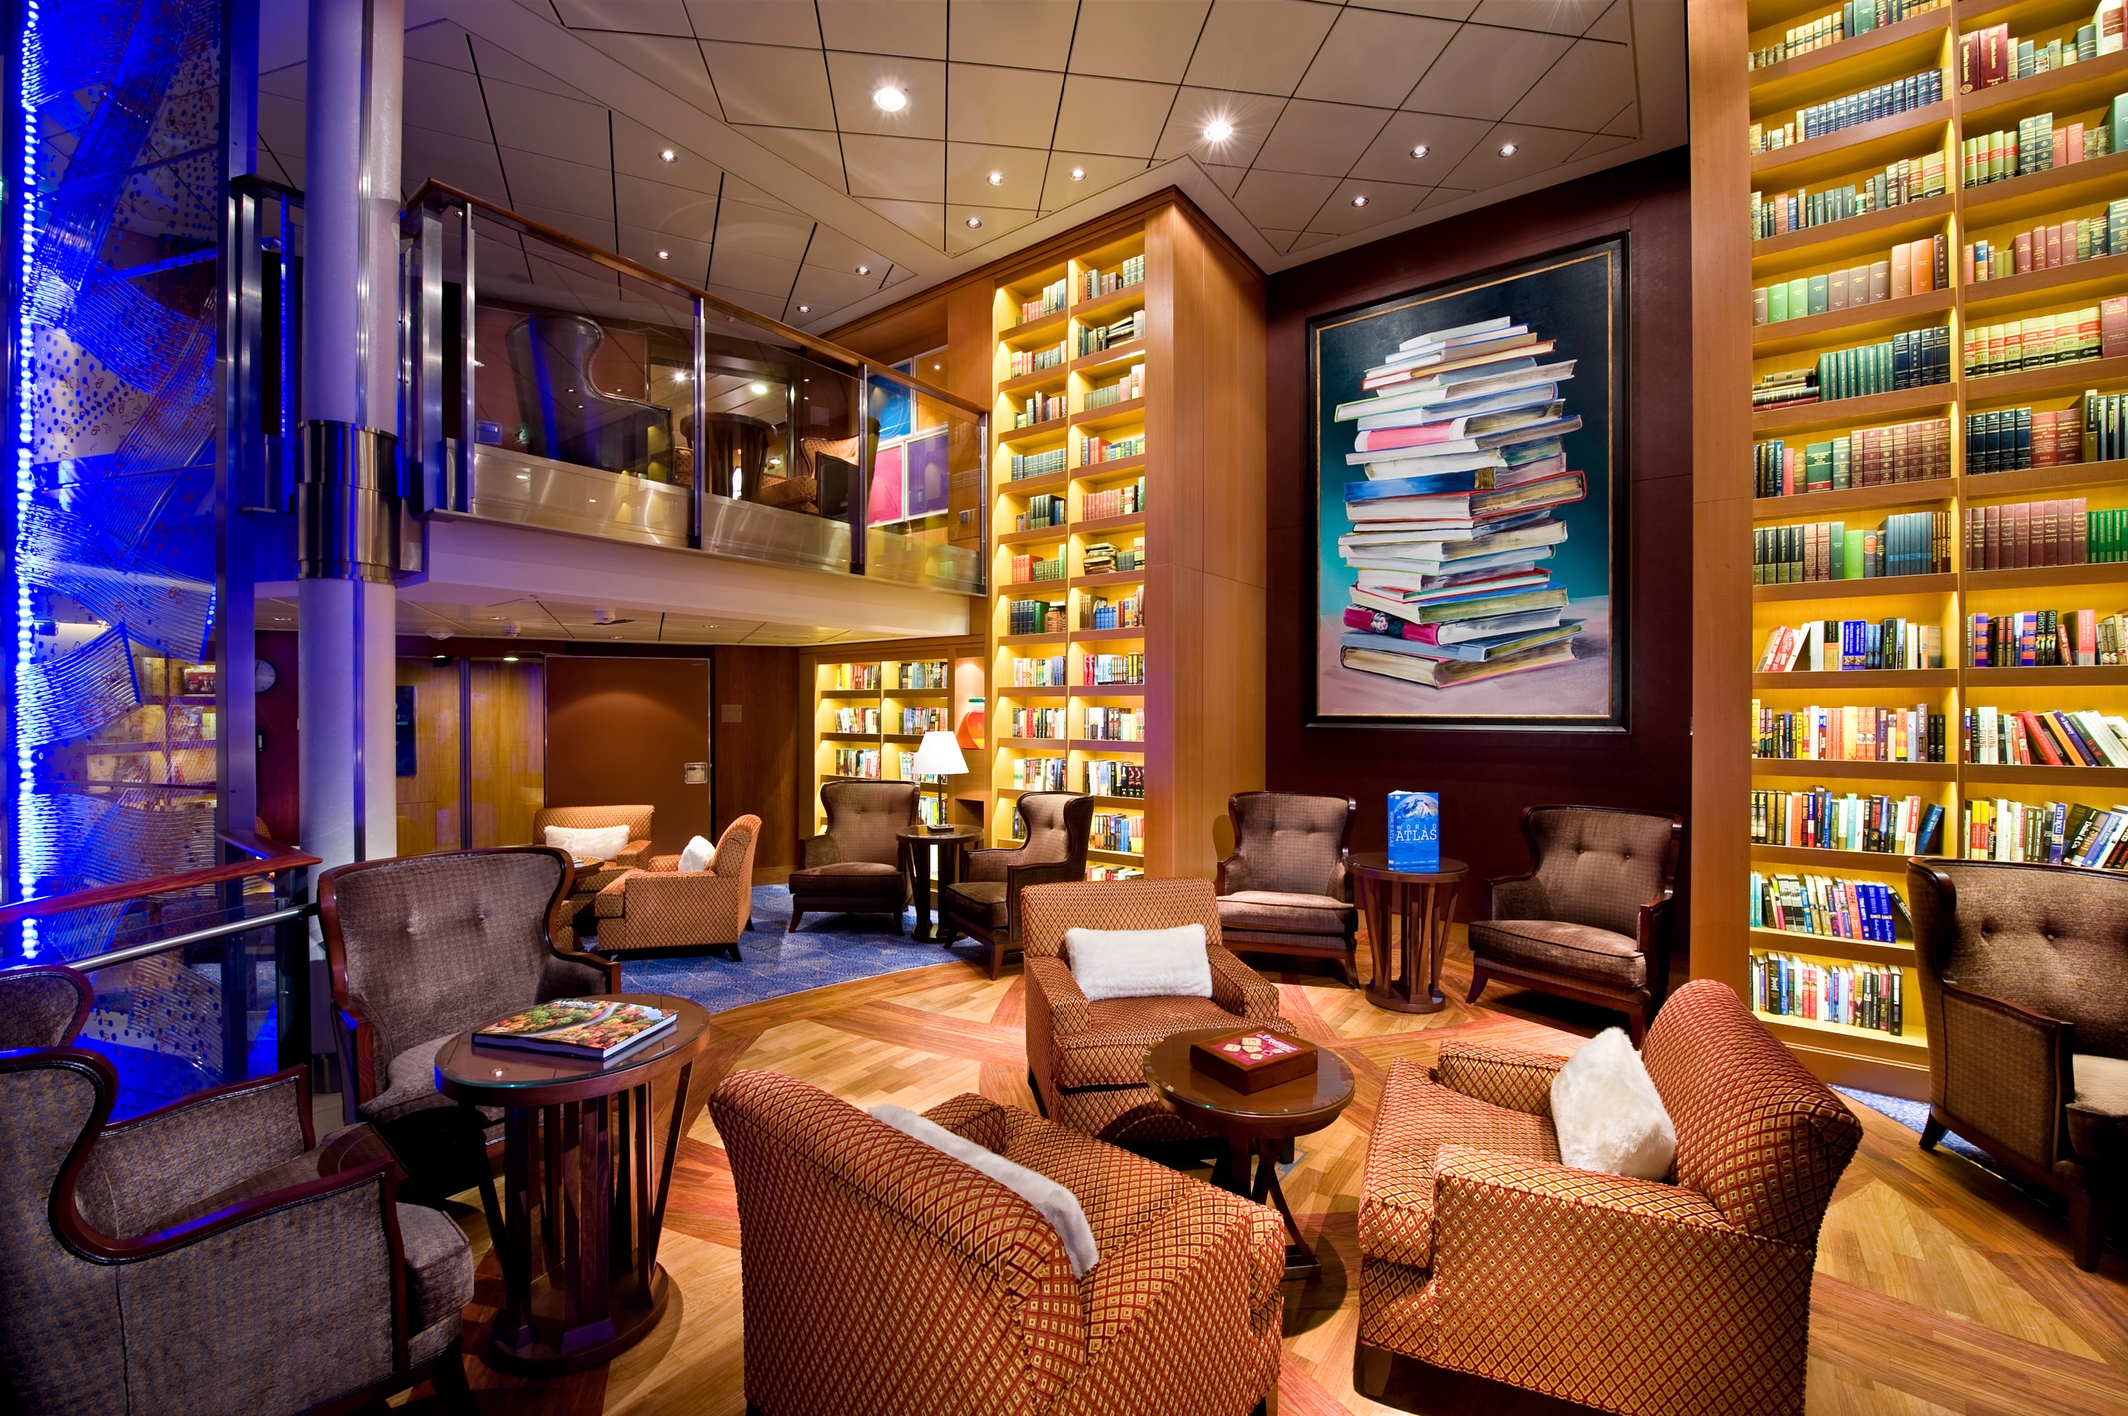 celebrity cruises library.jpg